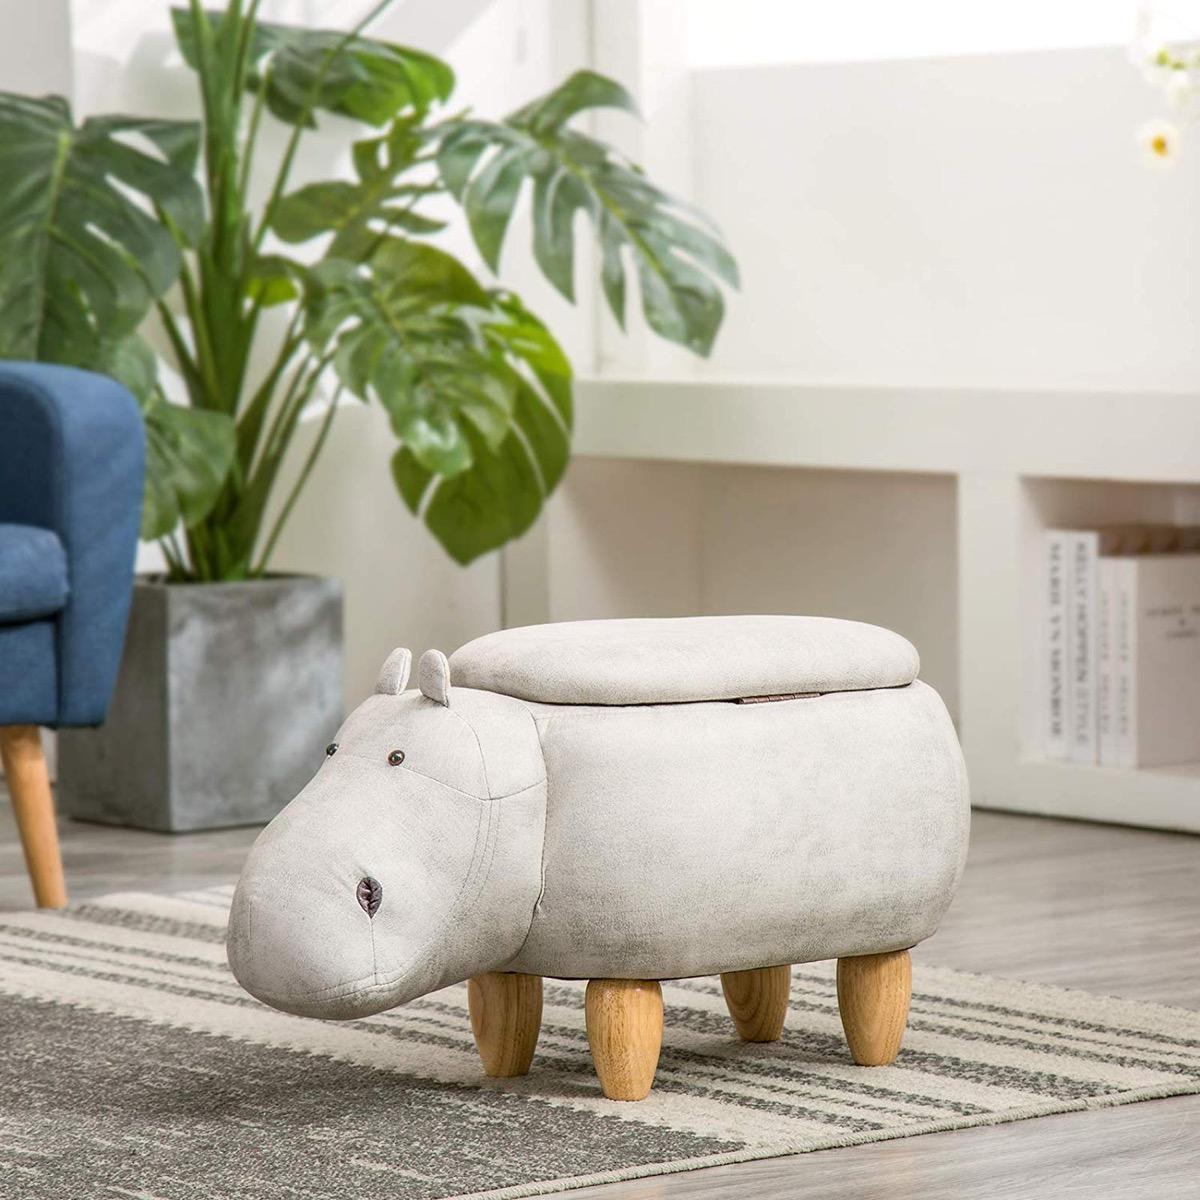 cute-animal-hippo-shaped-ottoman-kids-seat-with-storage